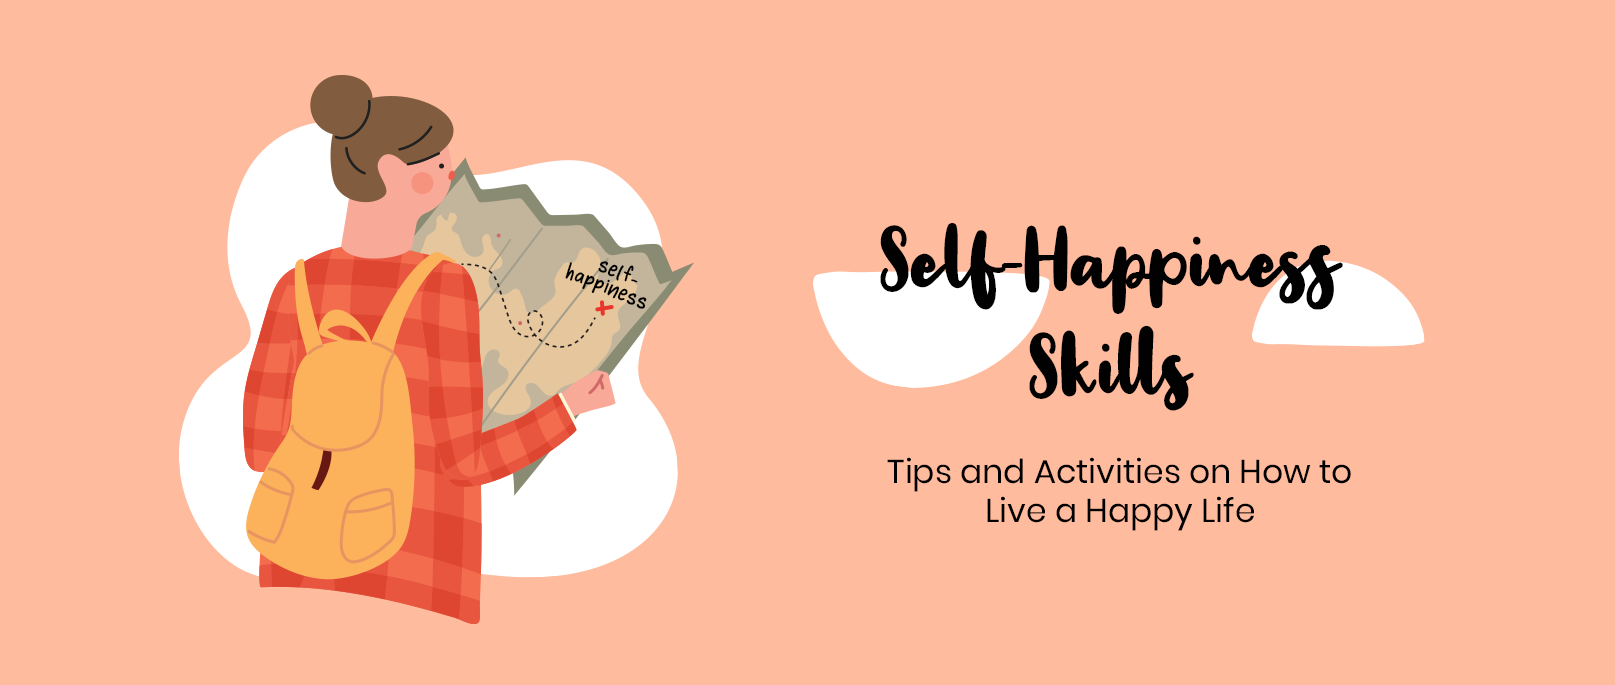 Self-Happiness